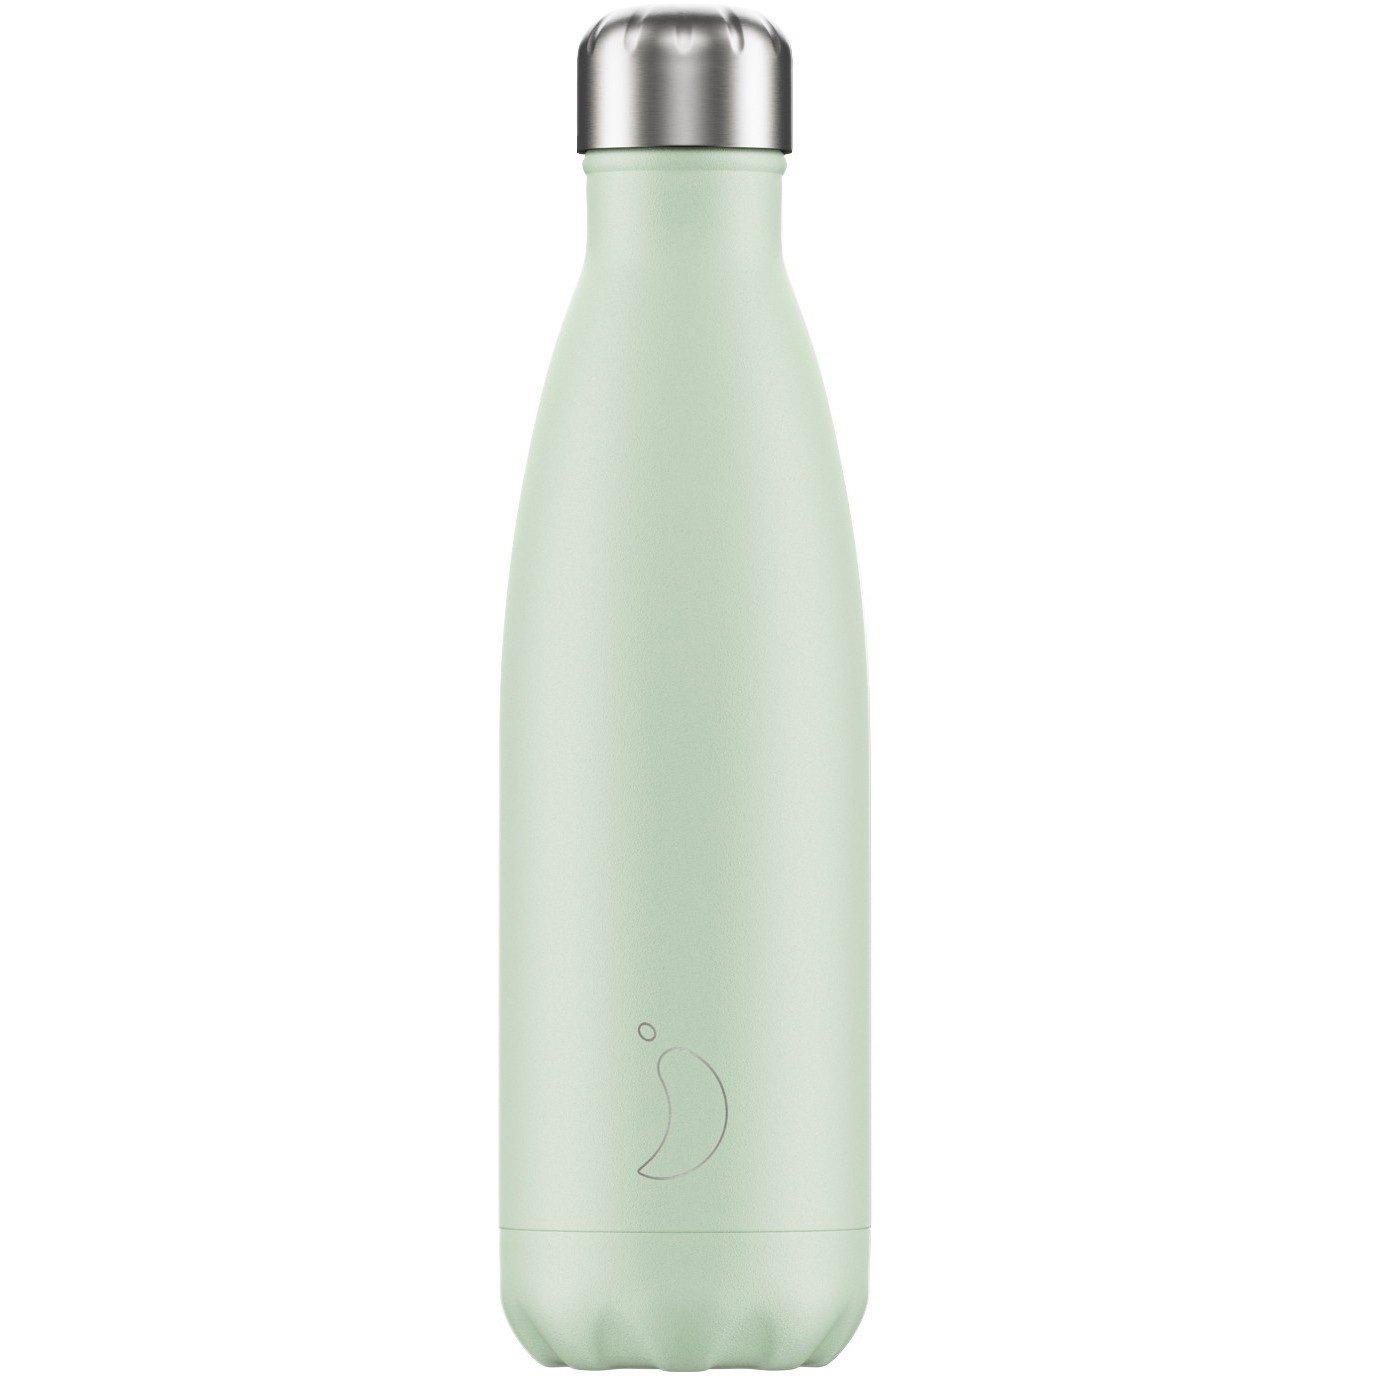 Chilly's Bottle Ανοξείδωτο Θερμός 500ml – Πράσινο Ανοιχτό